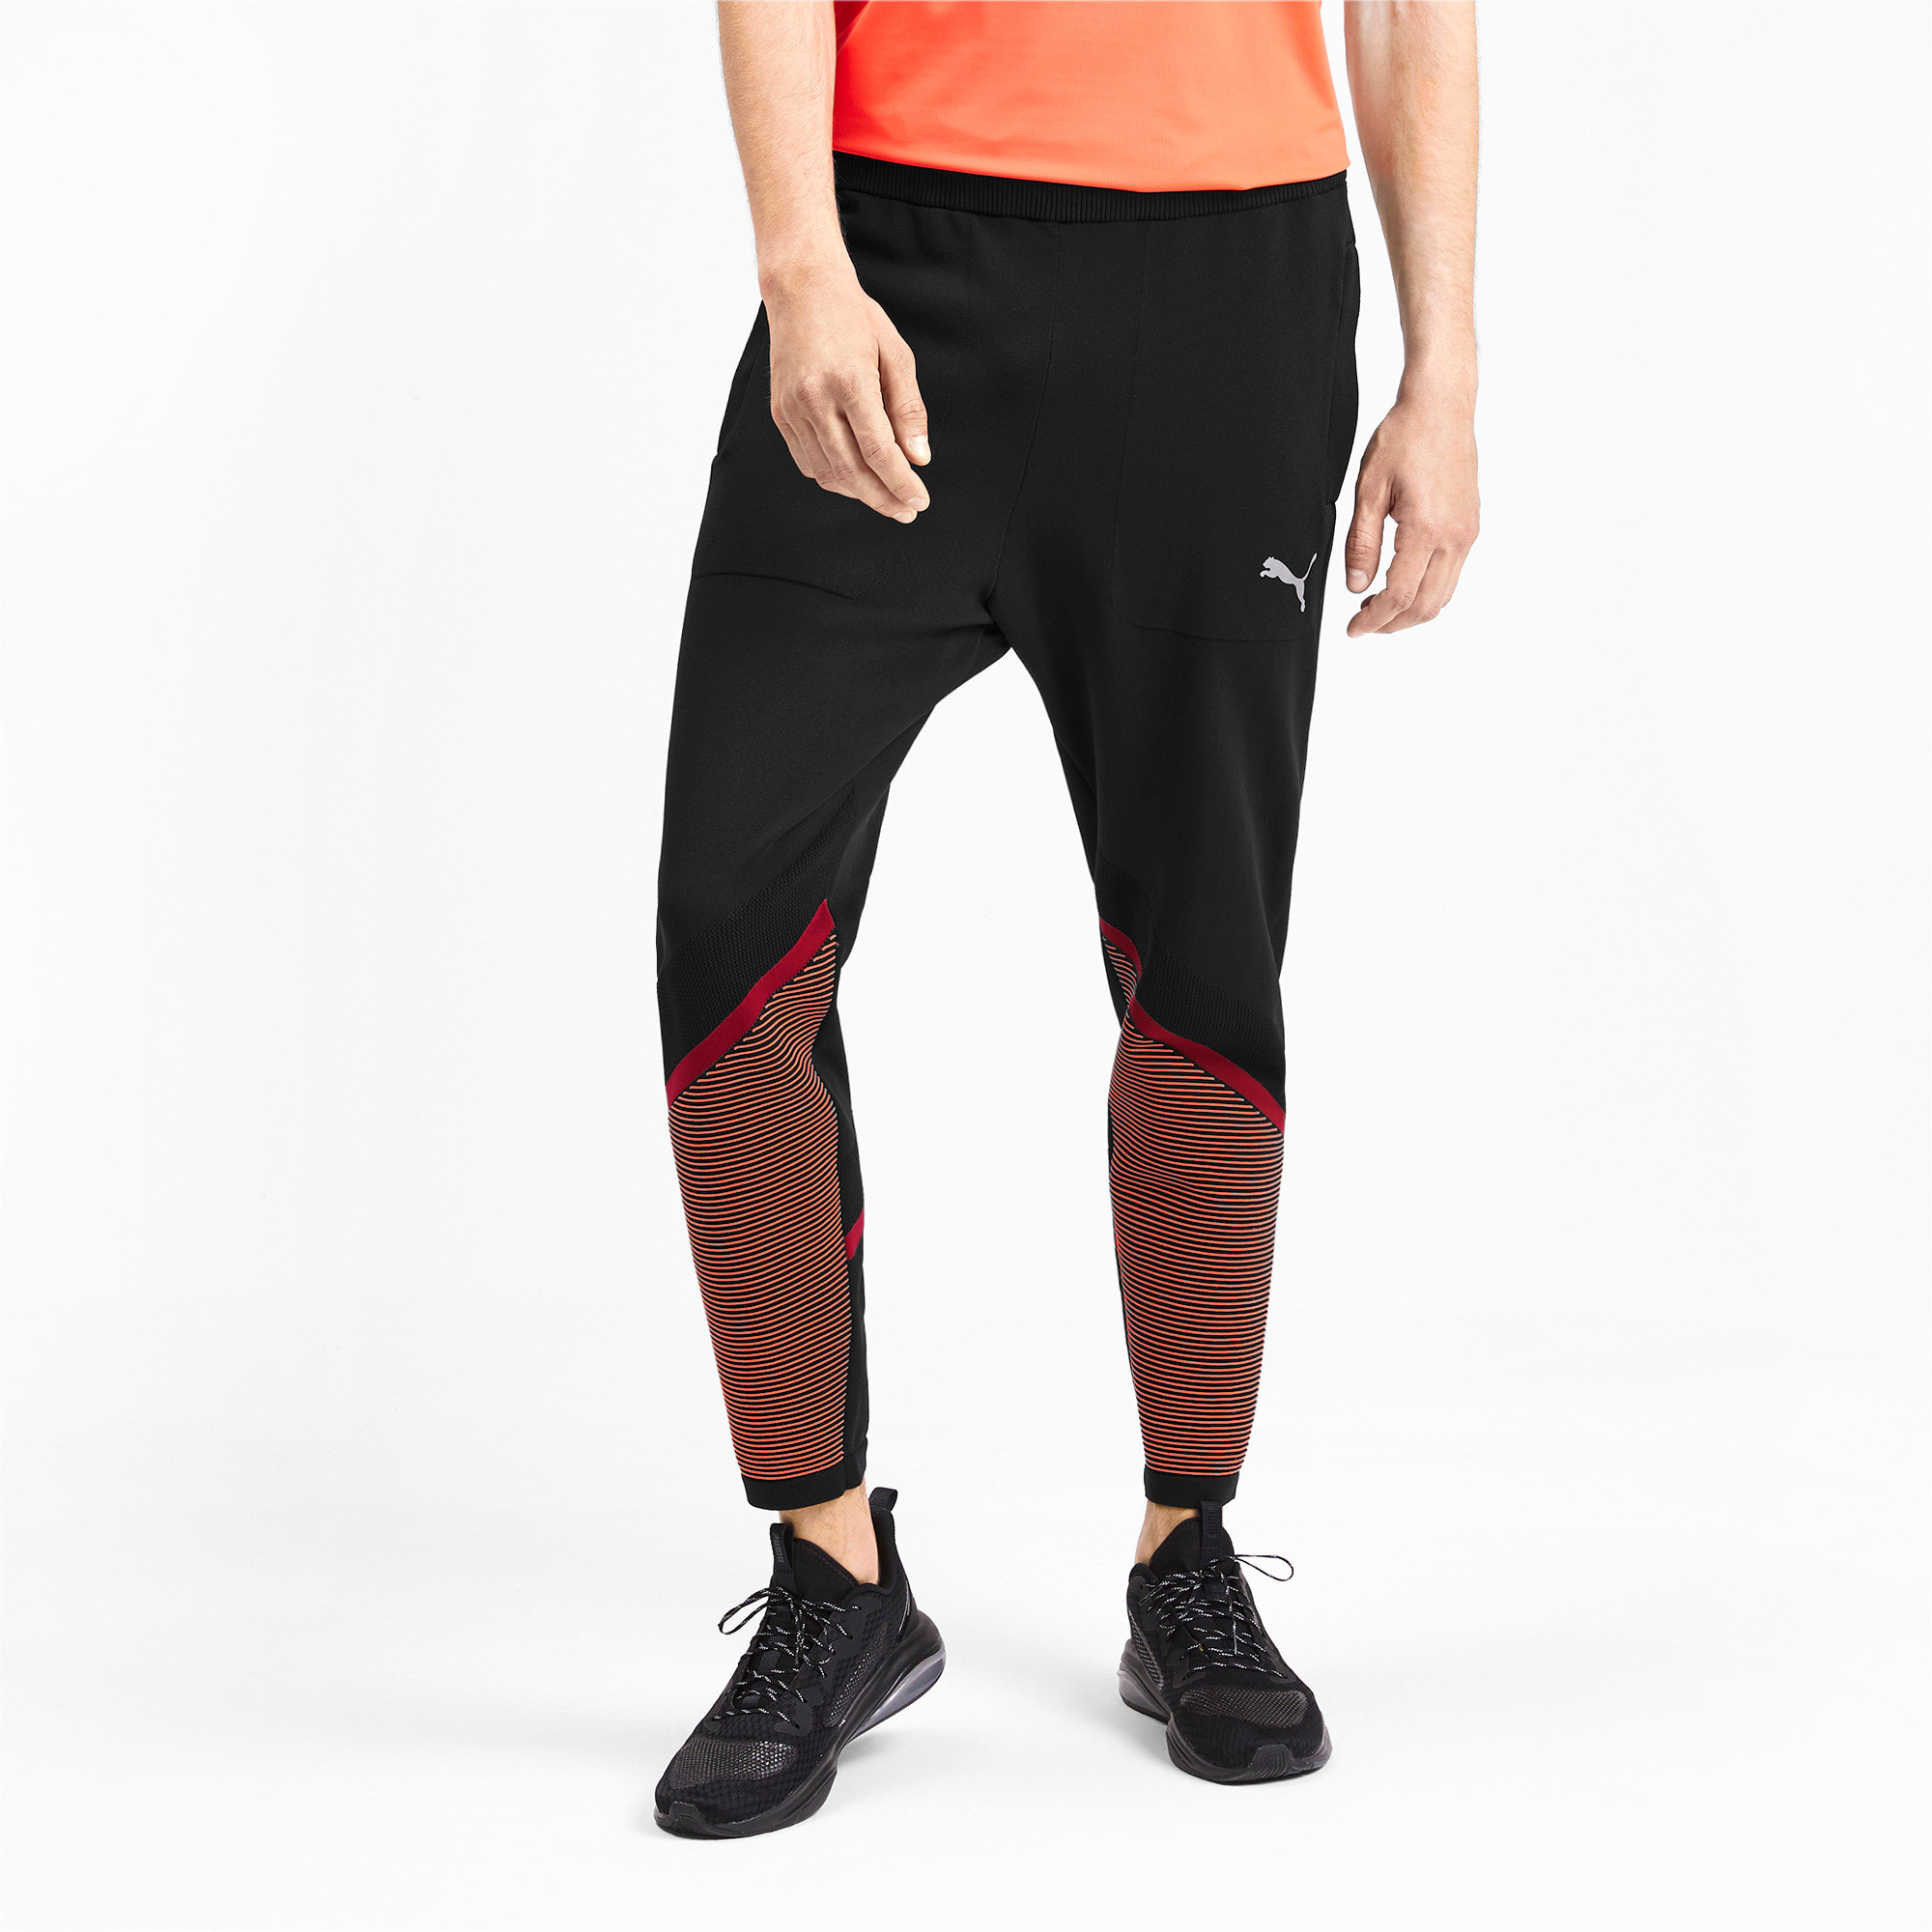 Miniatura 1 de Pantalones Reactive evoKNIT para hombre, Puma Black-Rhubarb, mediano